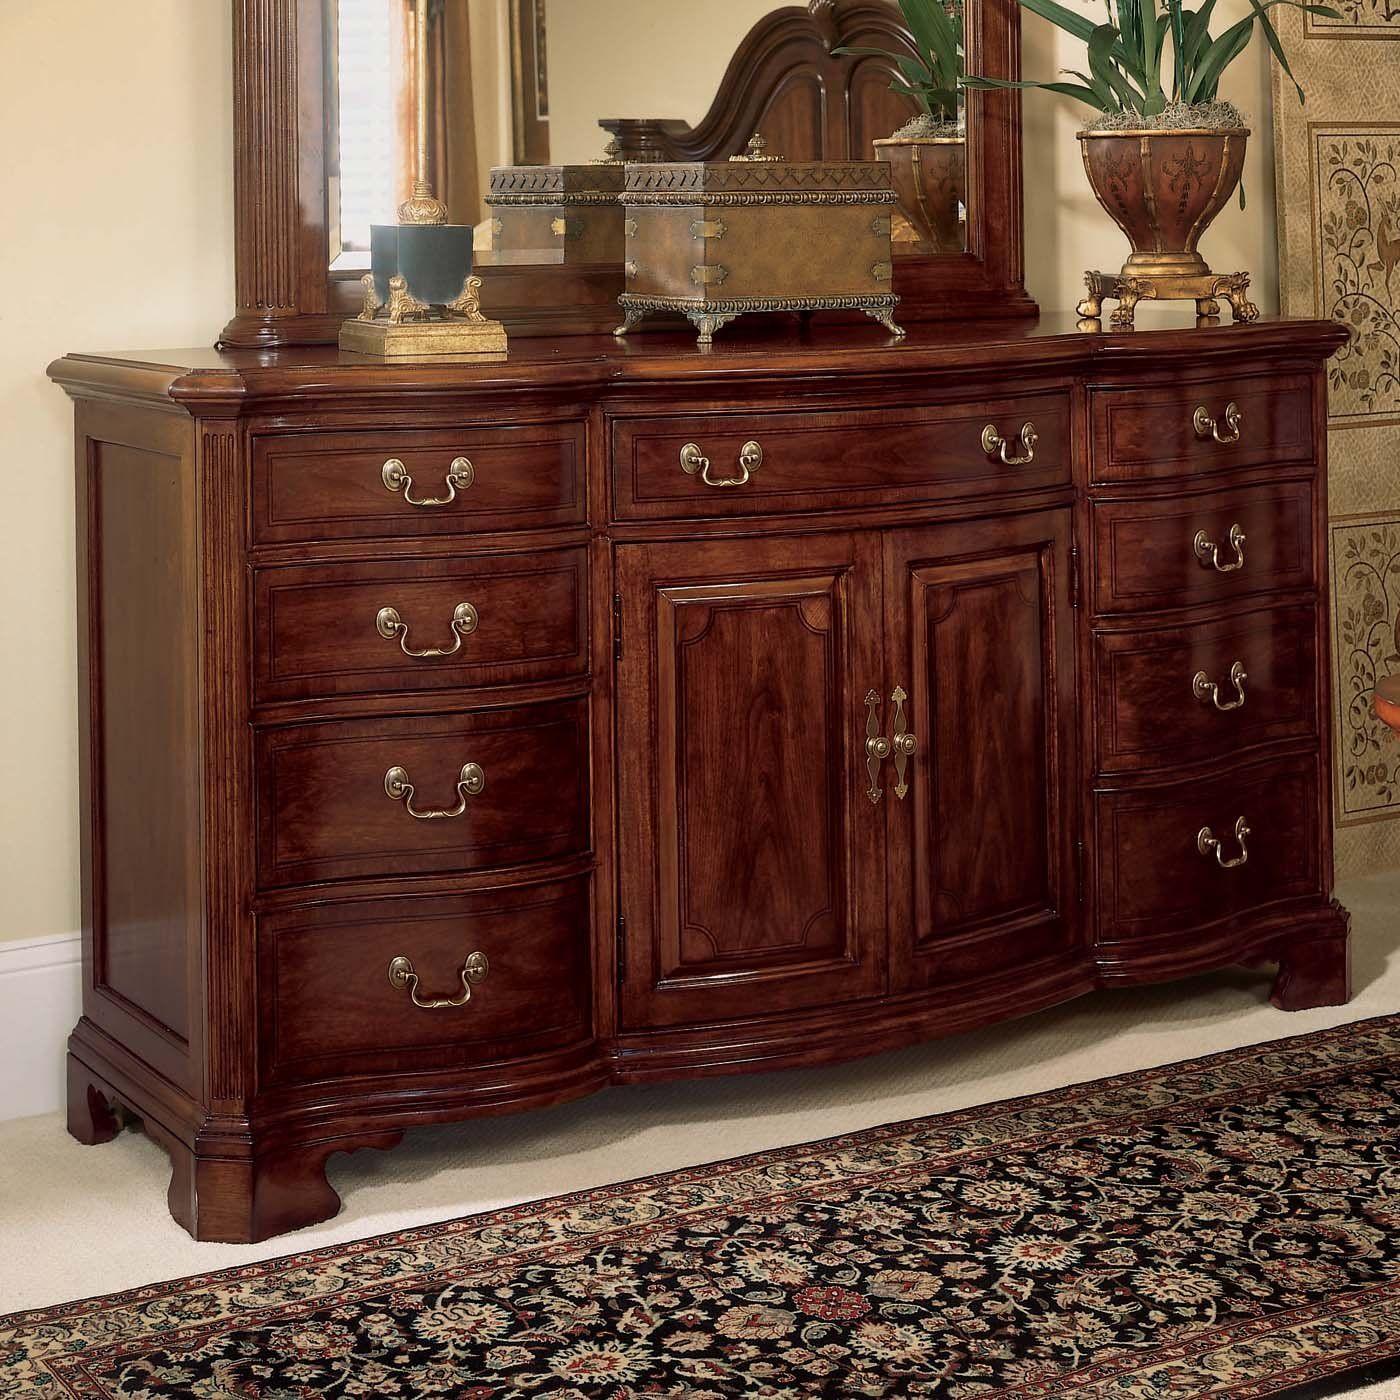 American Drew Furniture Care: American Drew 791-160 Cherry Grove 45th Triple Dresser